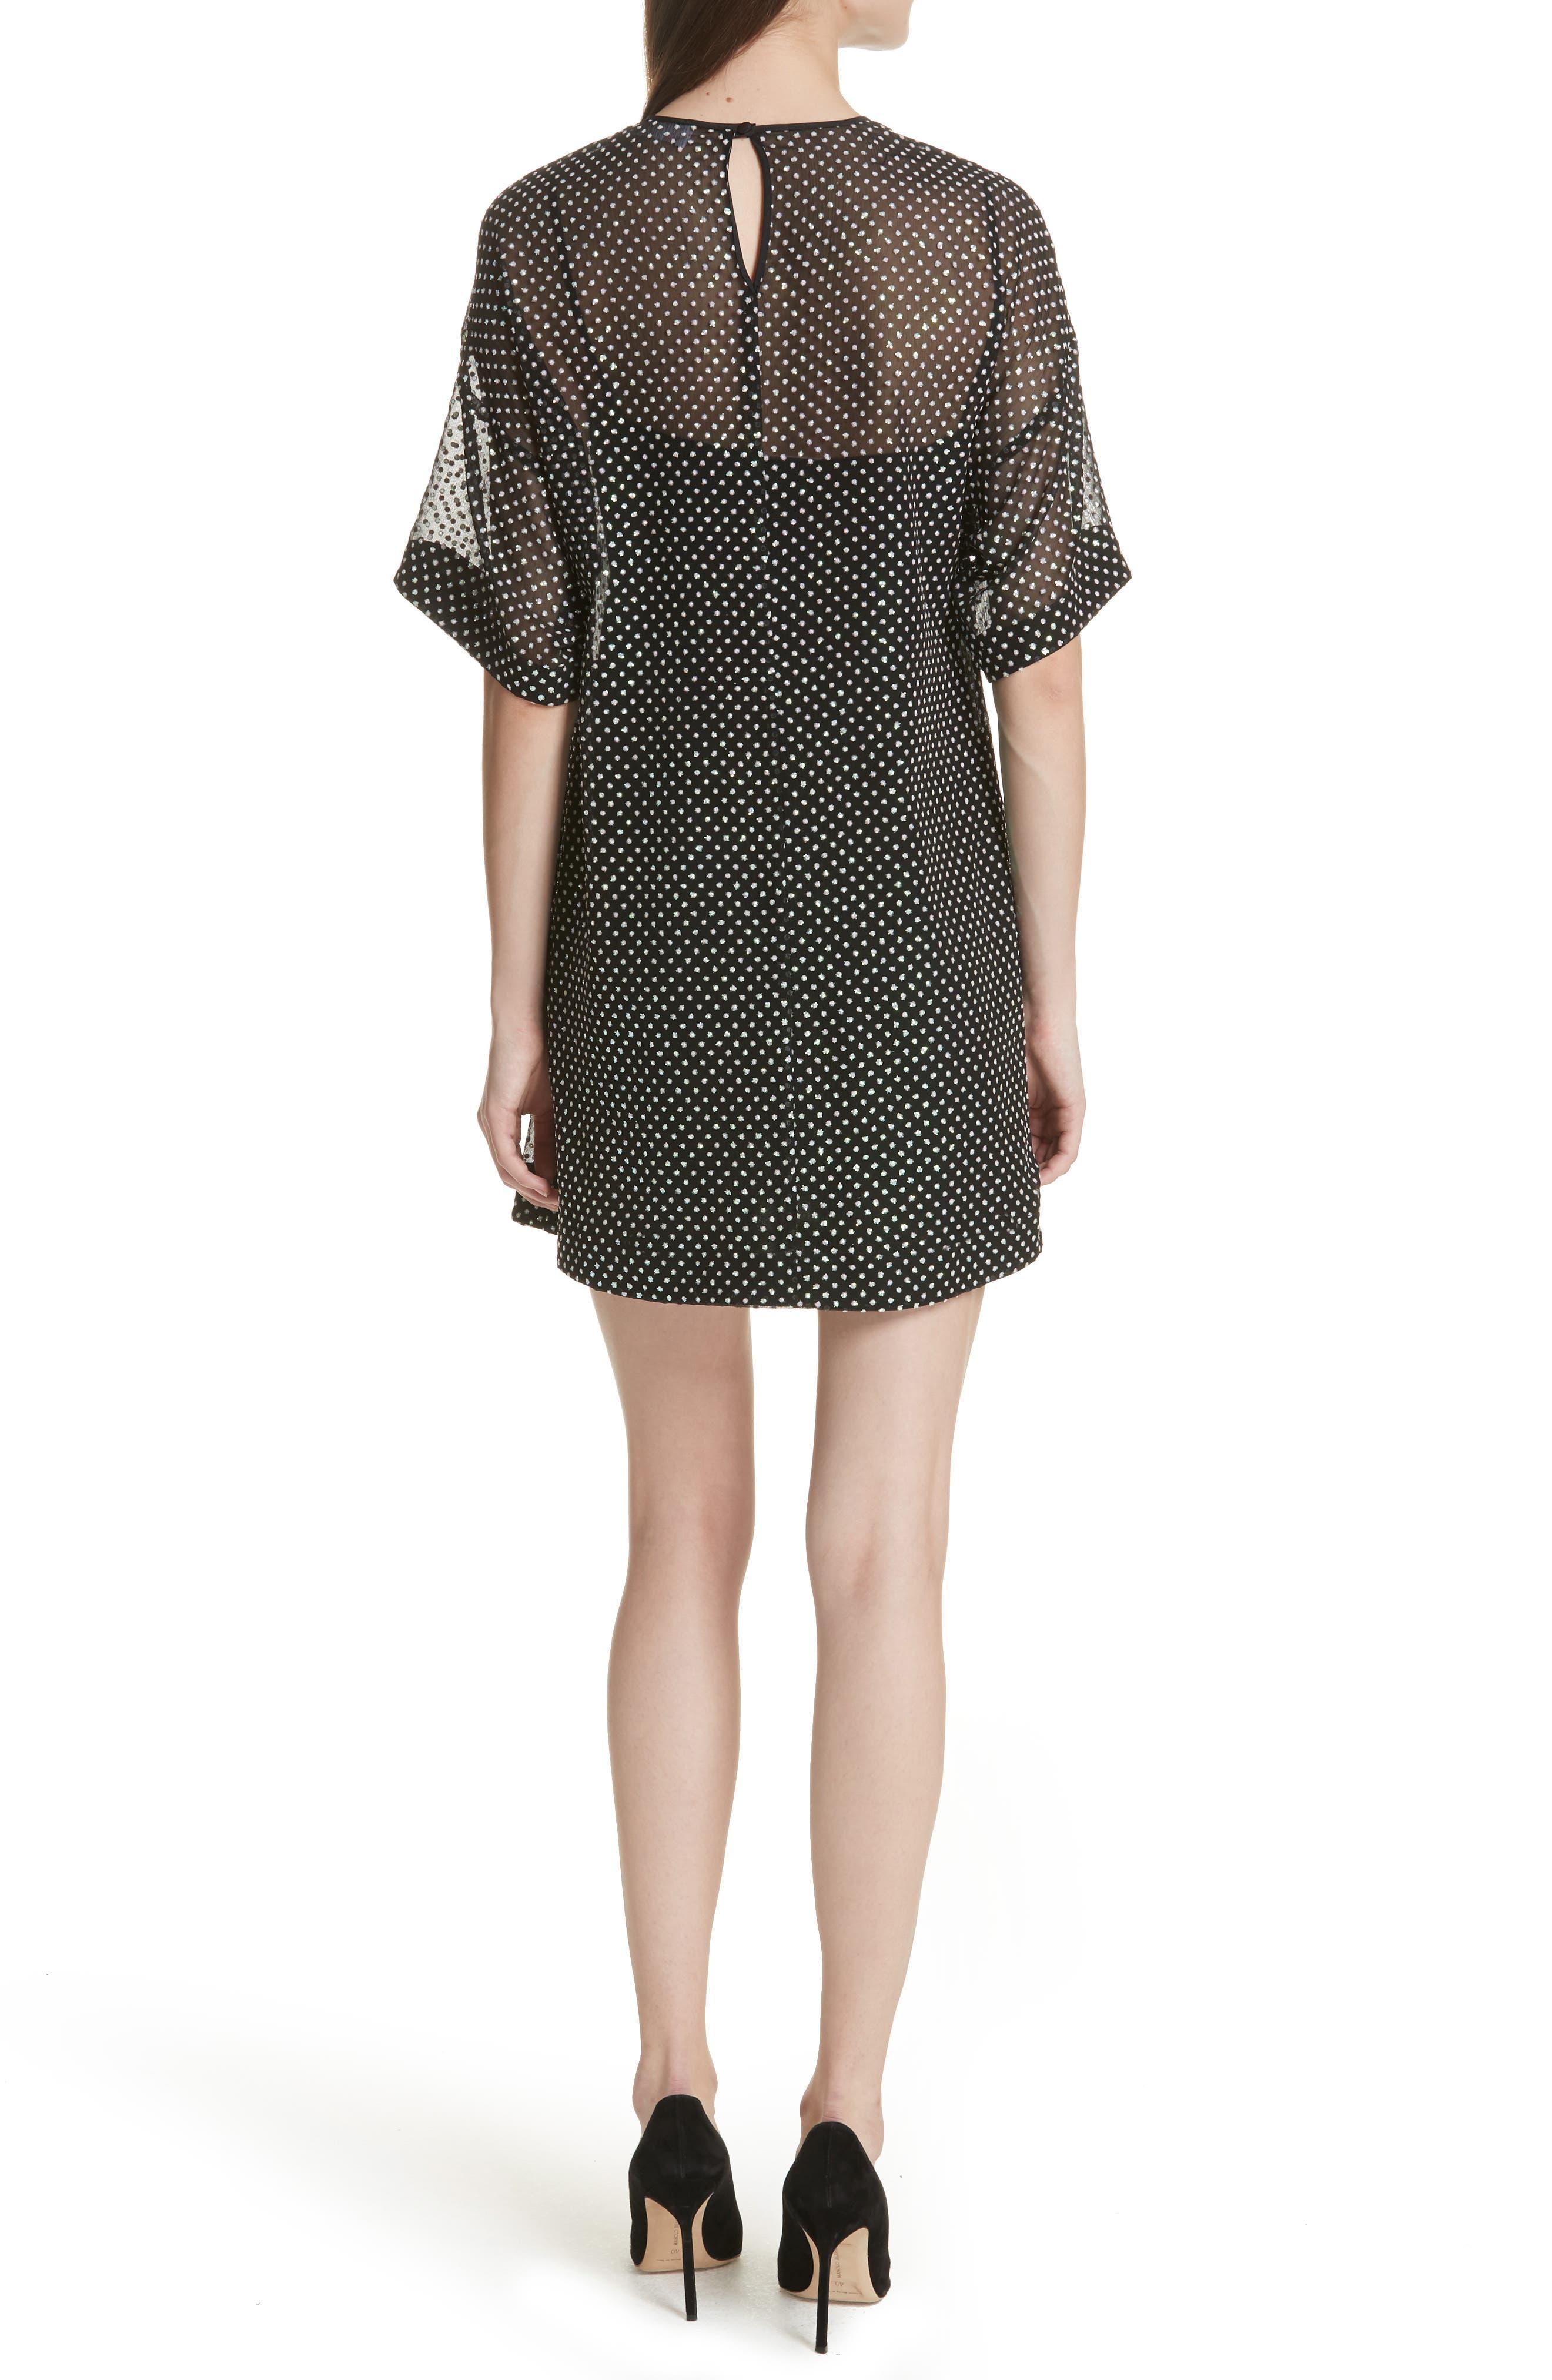 Creponne T-Shirt Dress,                             Alternate thumbnail 2, color,                             Black